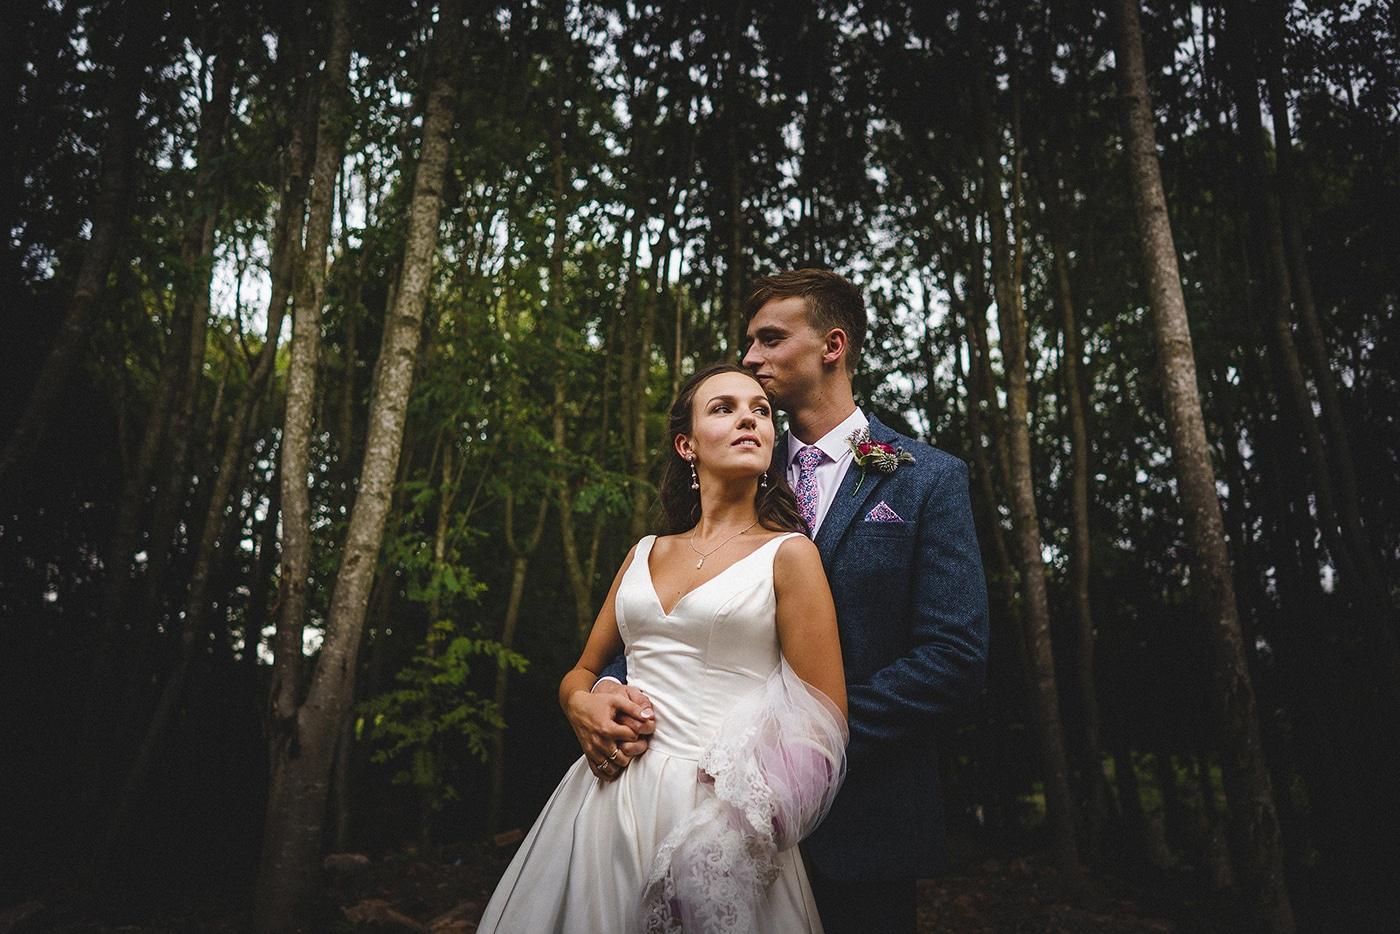 wedding photographer in shropshire 06